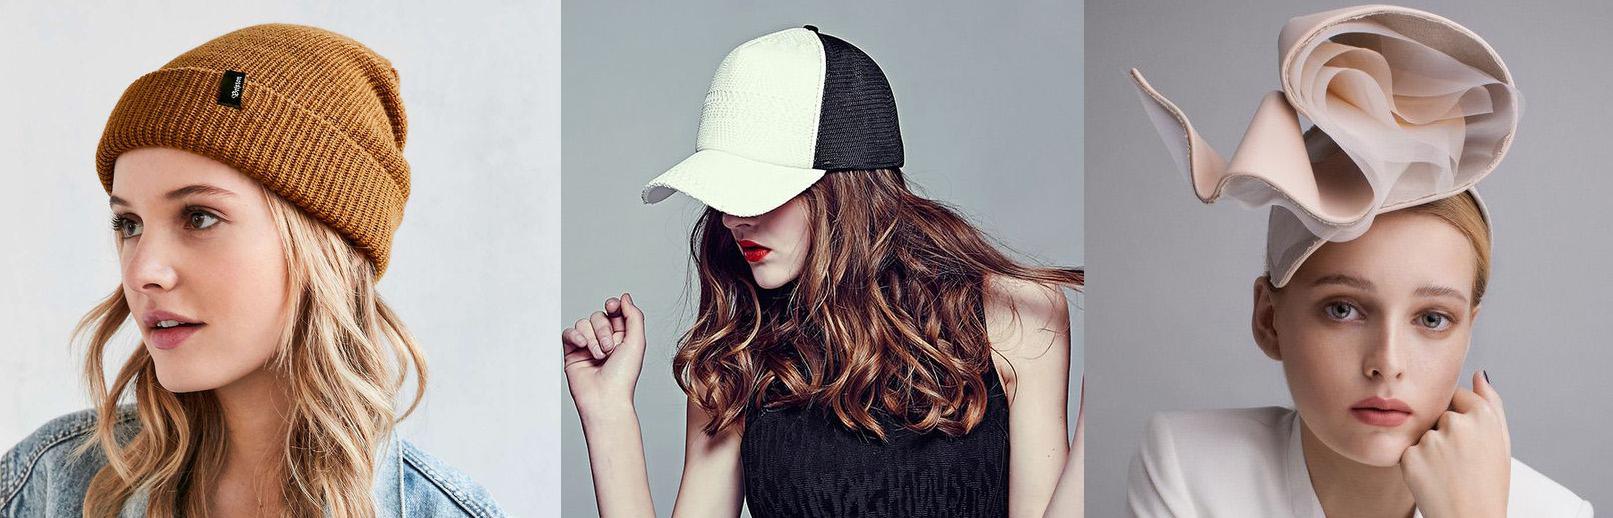 outfit grid womens hats beanie baseball cap fascinator